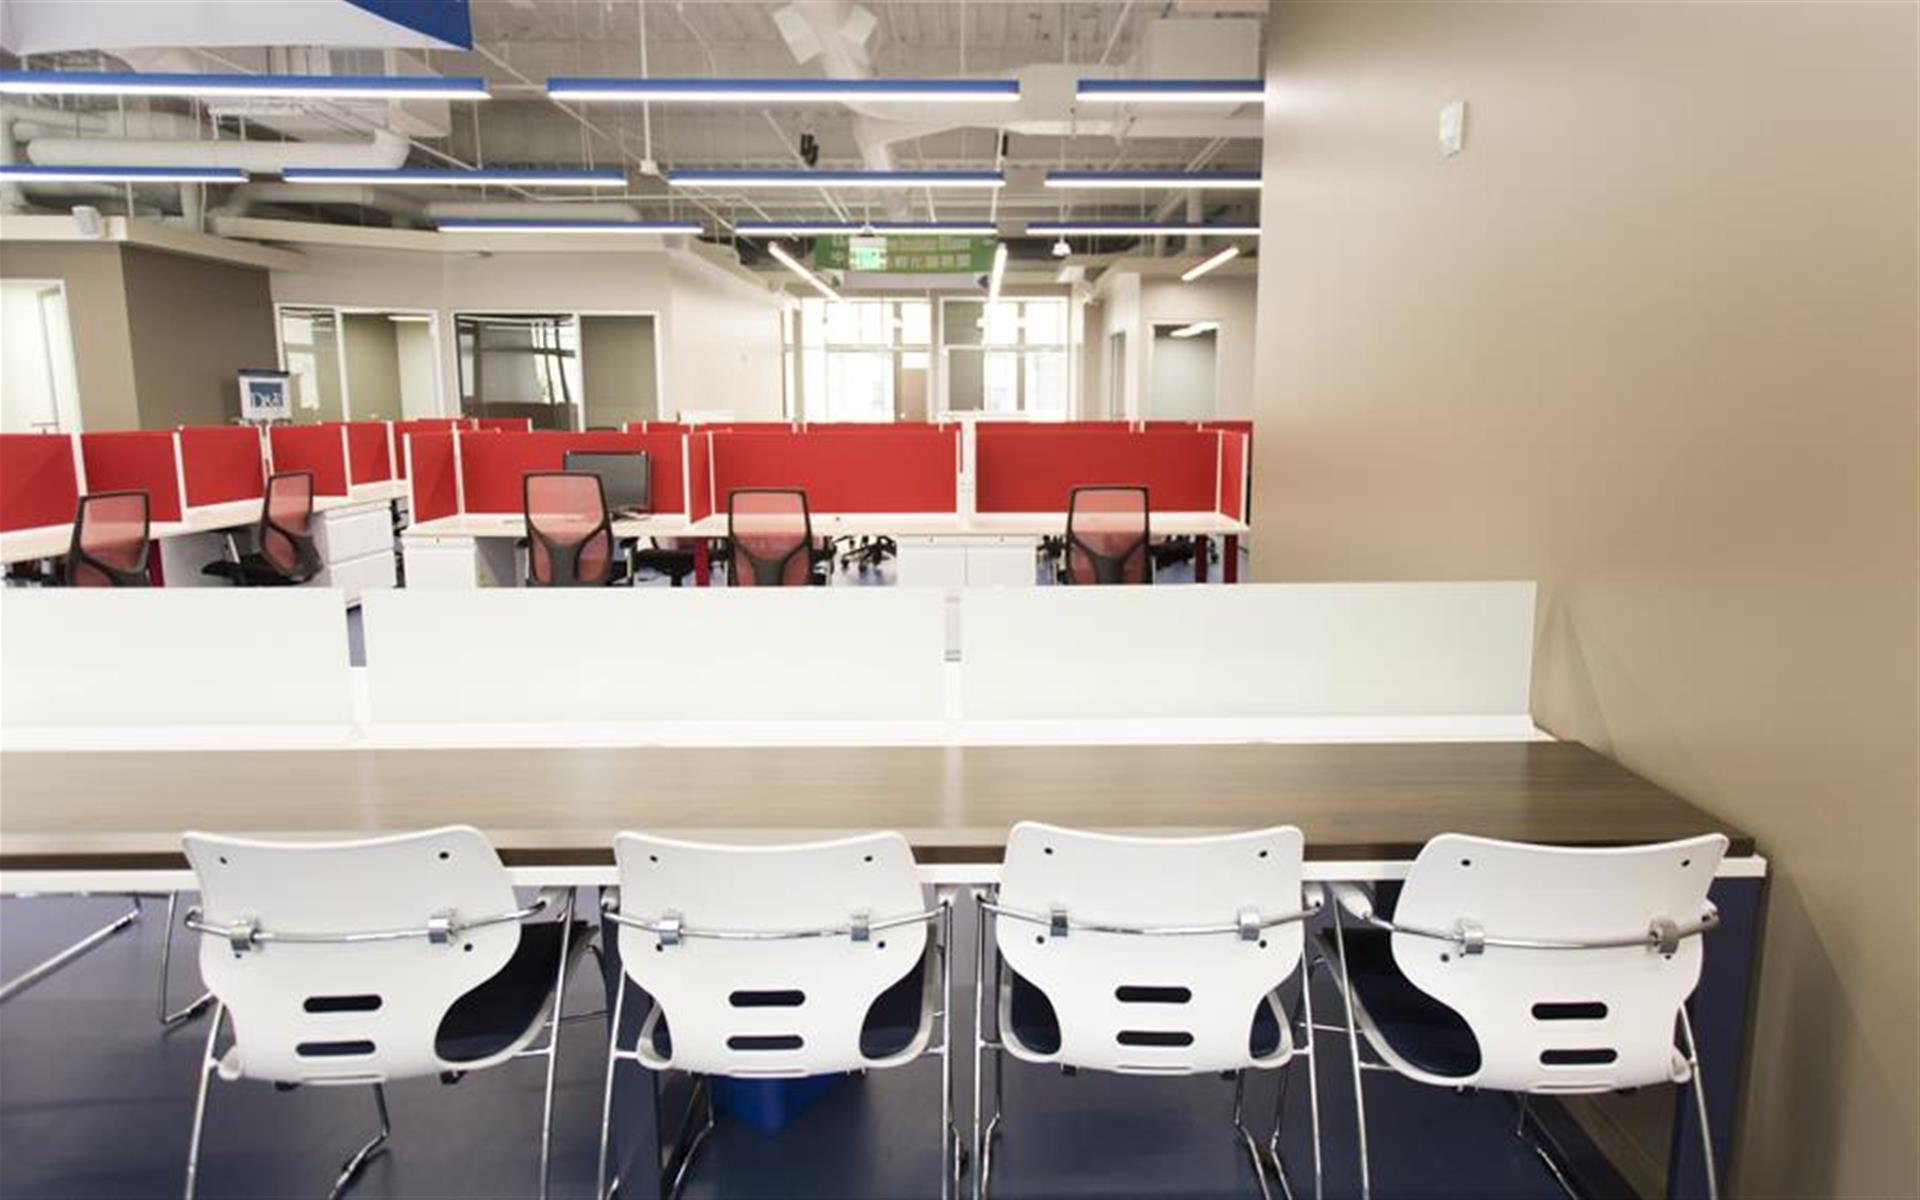 EpicSpaces Co-Working - Collaborative WorkSpace, Plus